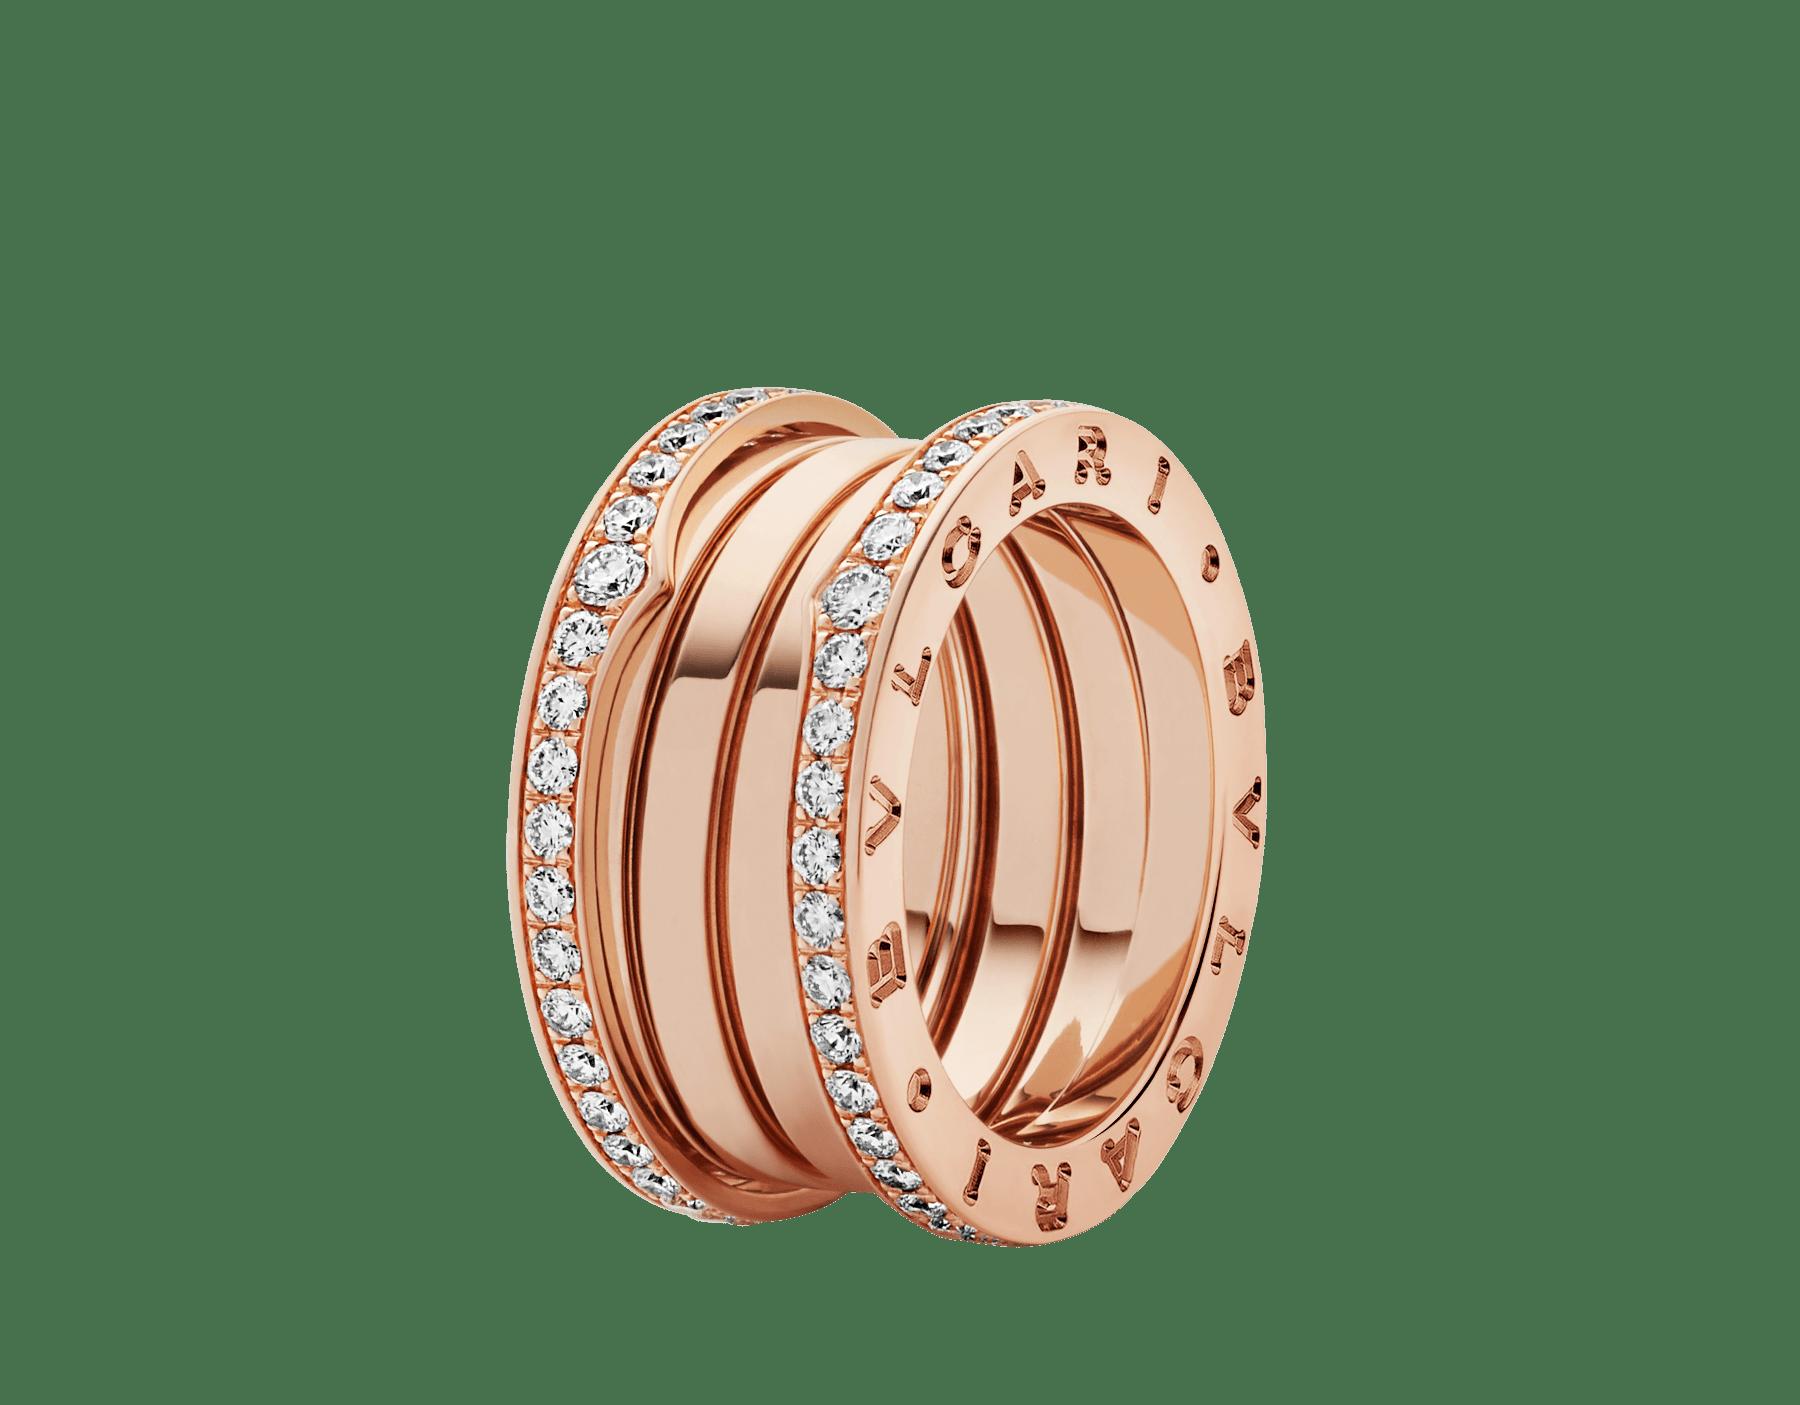 B.zero1四环戒指,18K玫瑰金材质,边缘密镶钻石。 B-zero1-4-bands-AN856293 image 1